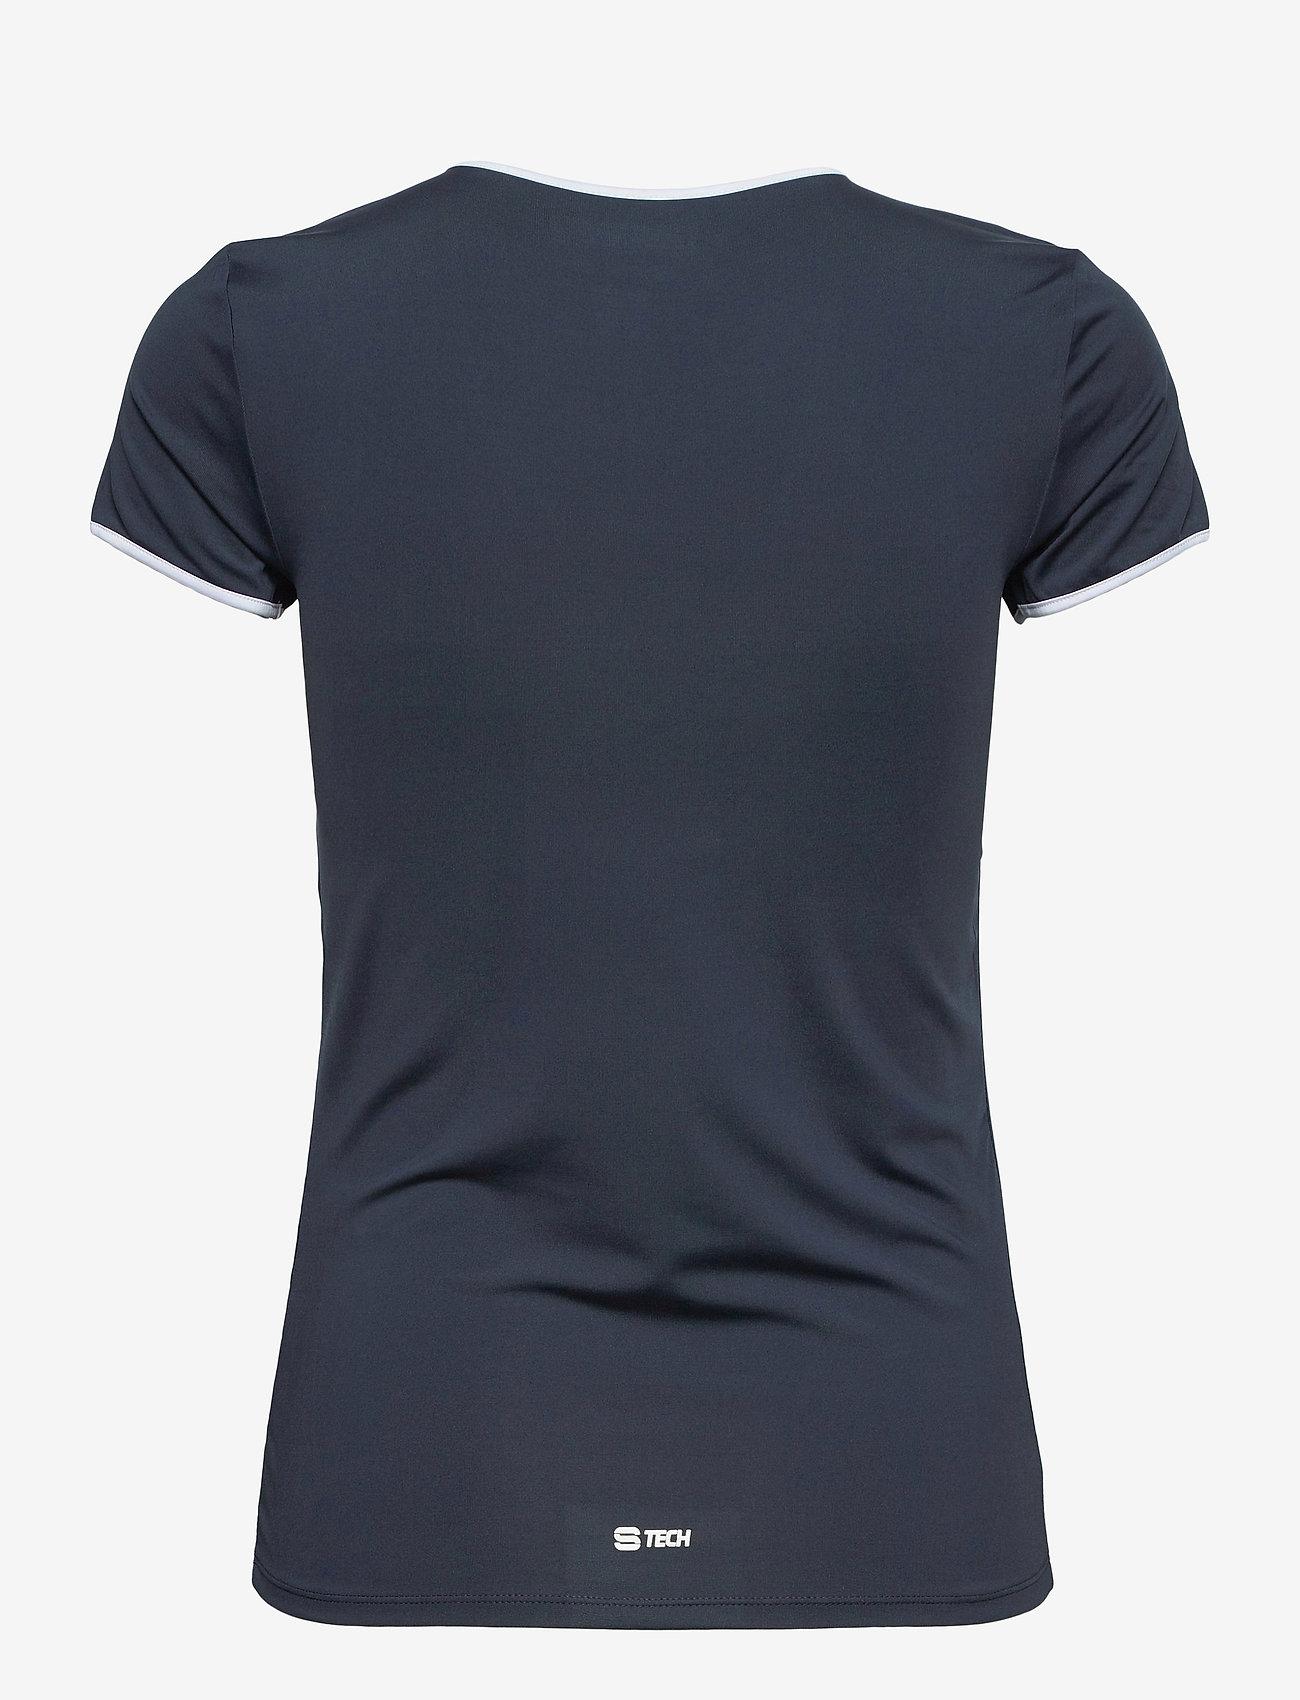 Sergio Tacchini - EVA T-SHIRT - t-shirts - navy/white - 1